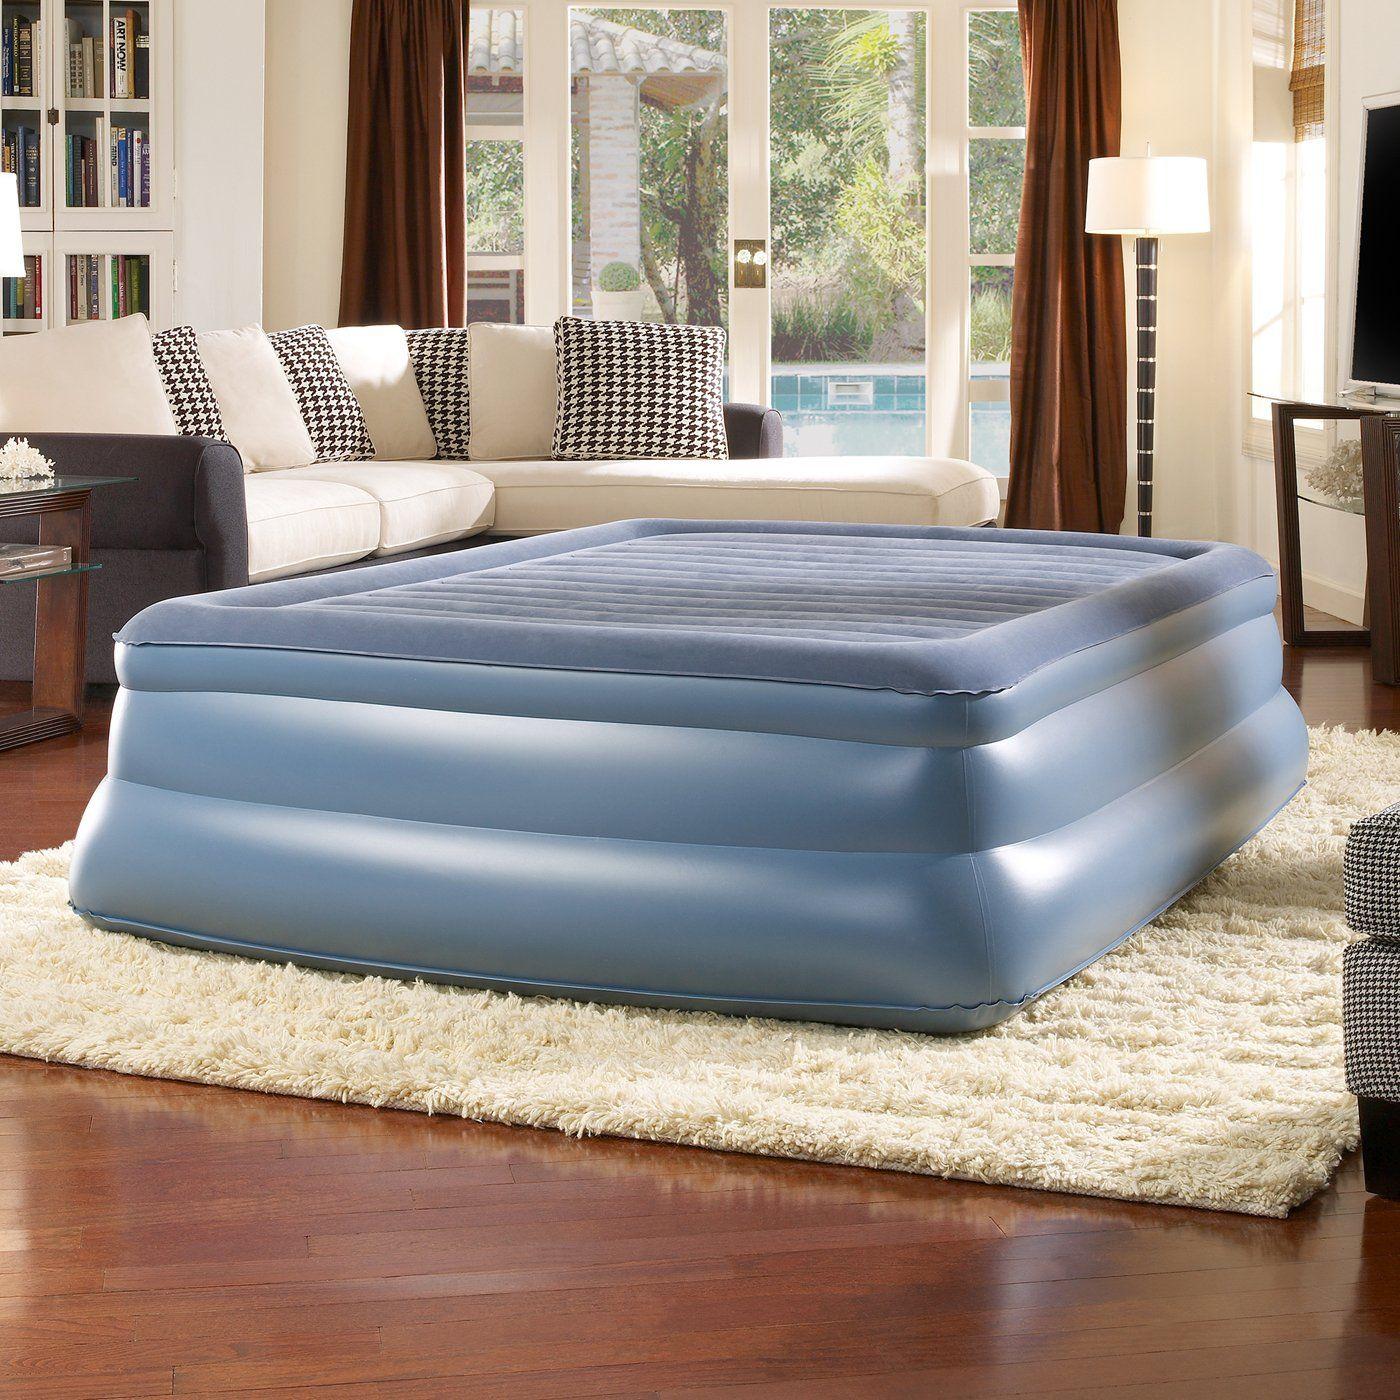 10 discount on Sleeping Lazy Bag Inflatable sofa